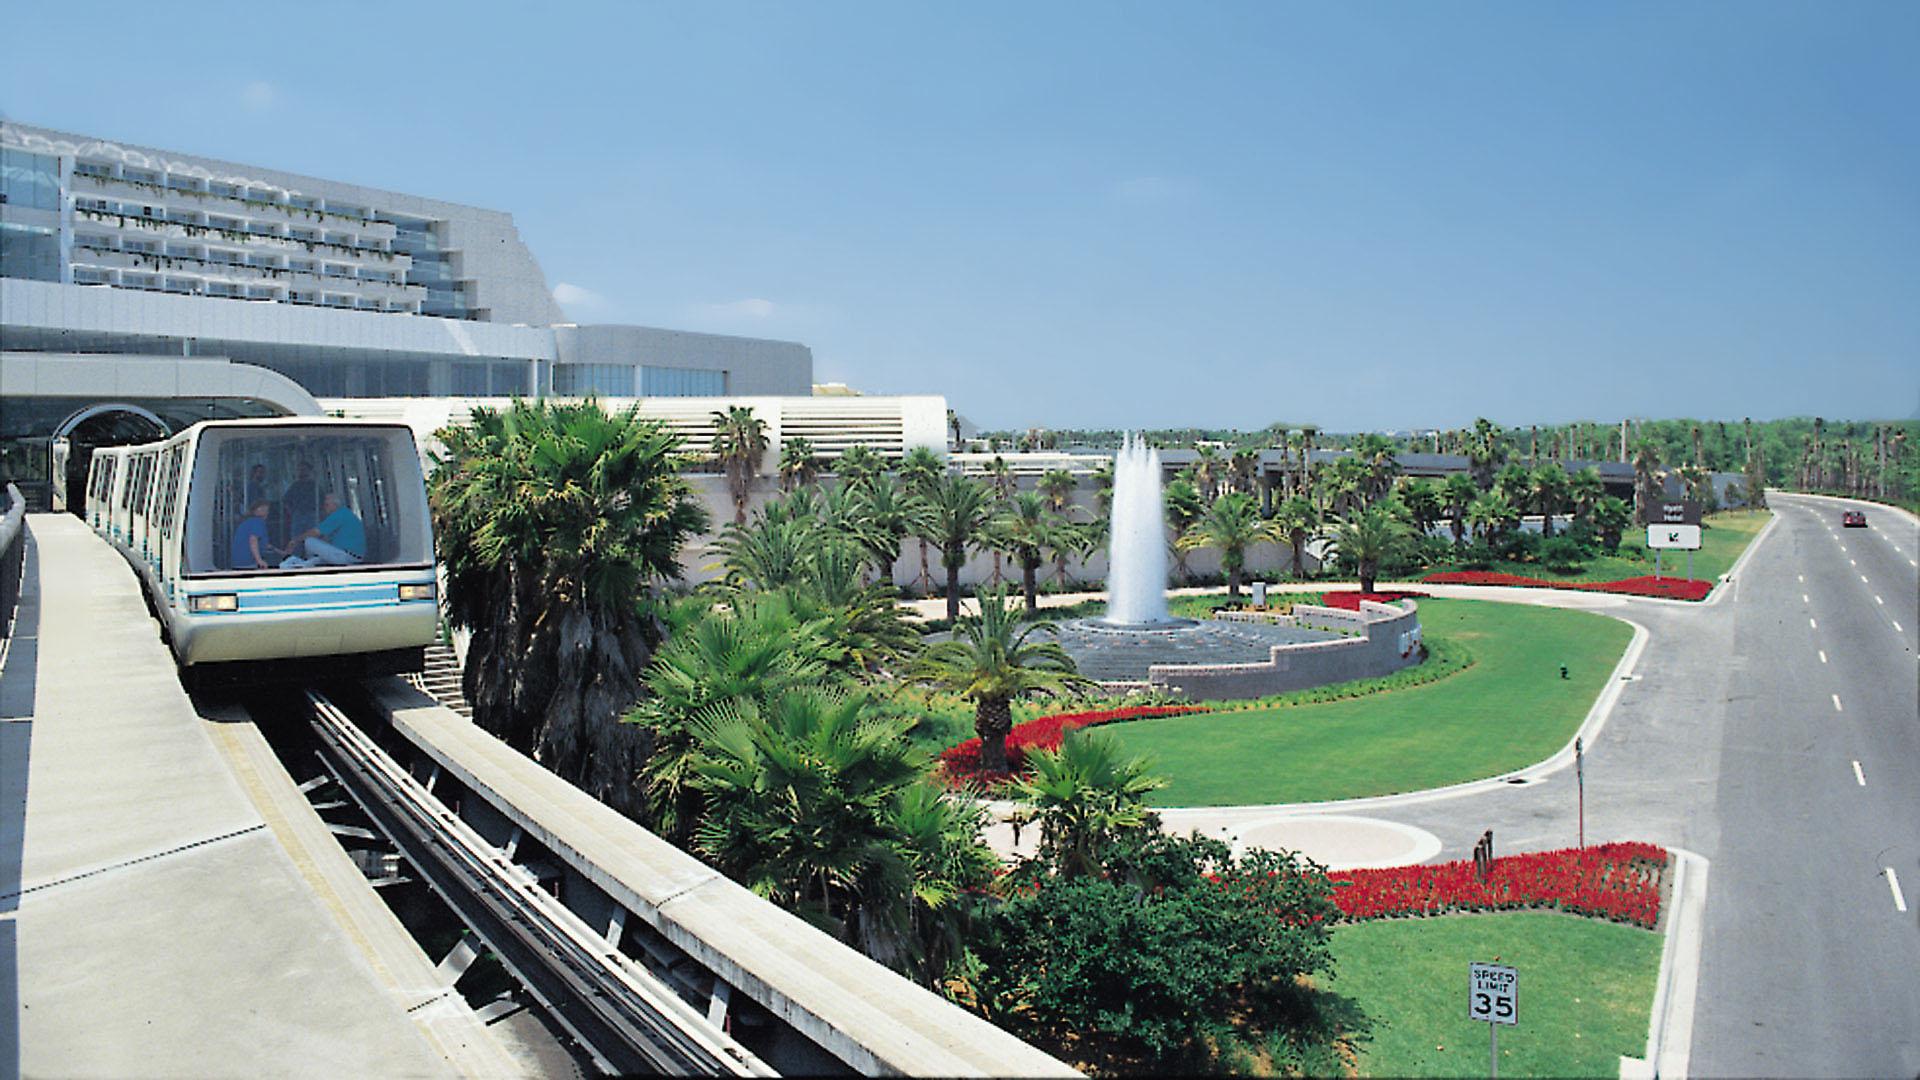 Orlando International Airport, monorail